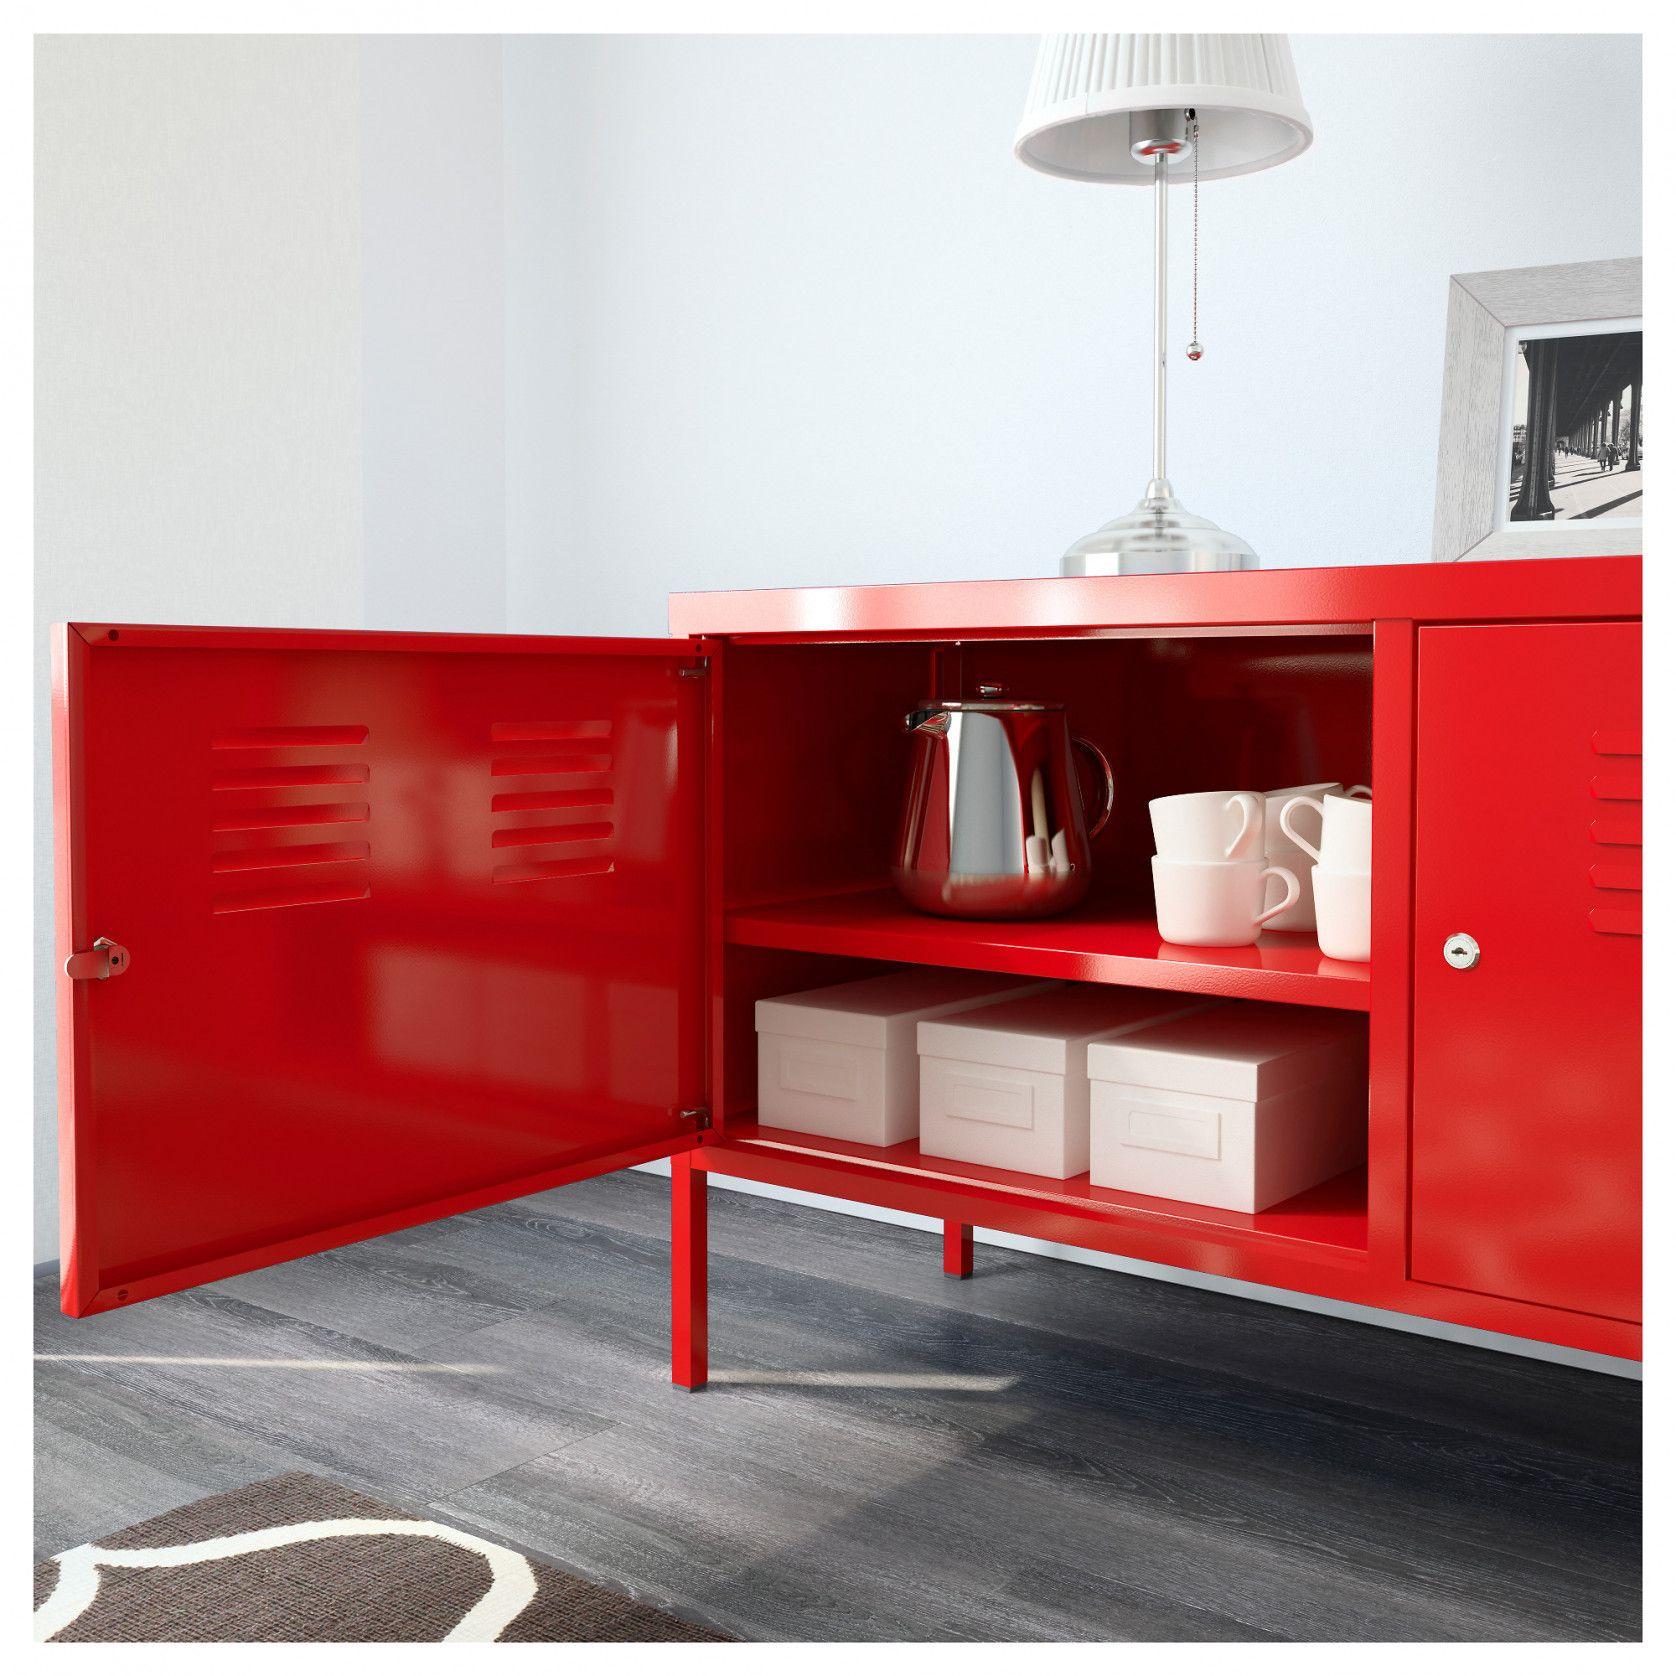 Exceptionnel 20+ Ikea Metal Locker Cabinet   Kitchen Floor Vinyl Ideas Check More At  Http: